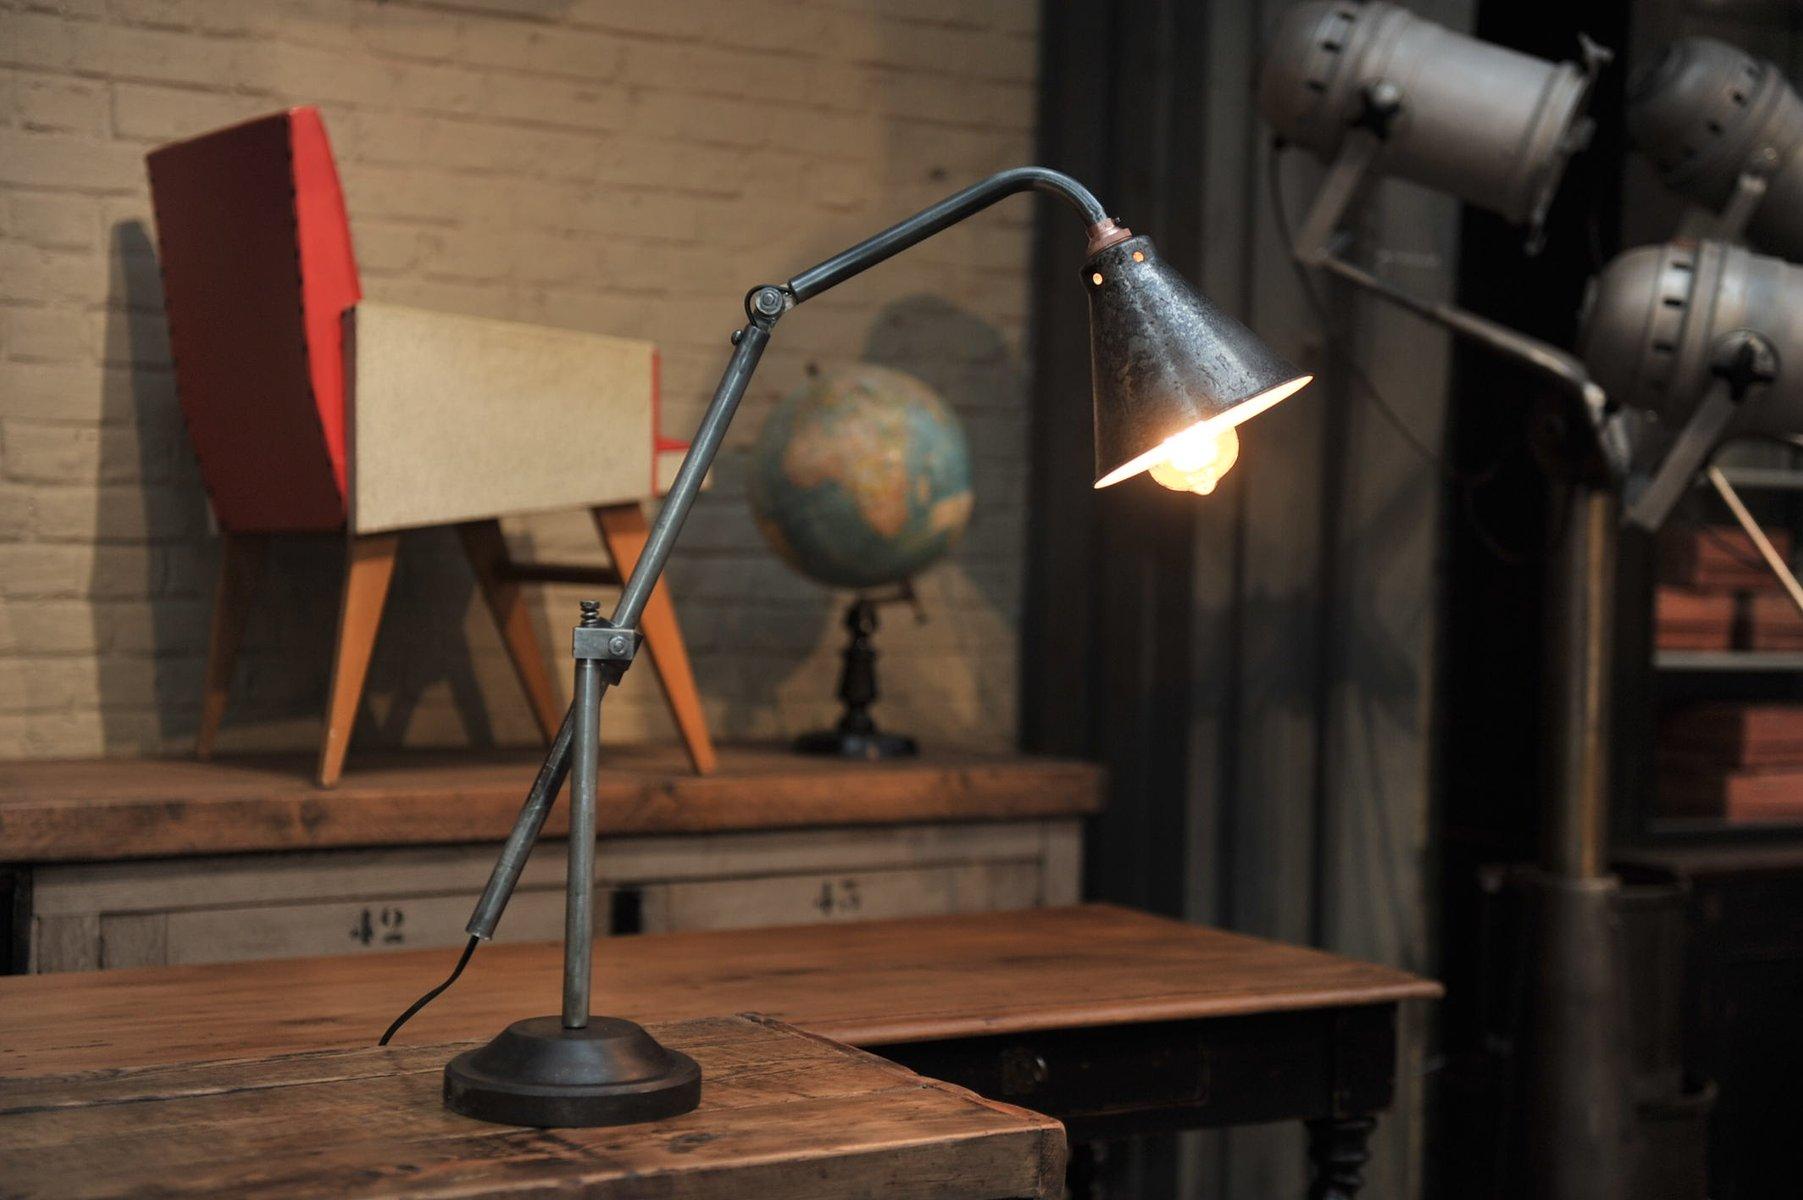 lampe de bureau articul e industrielle france 1930s en. Black Bedroom Furniture Sets. Home Design Ideas